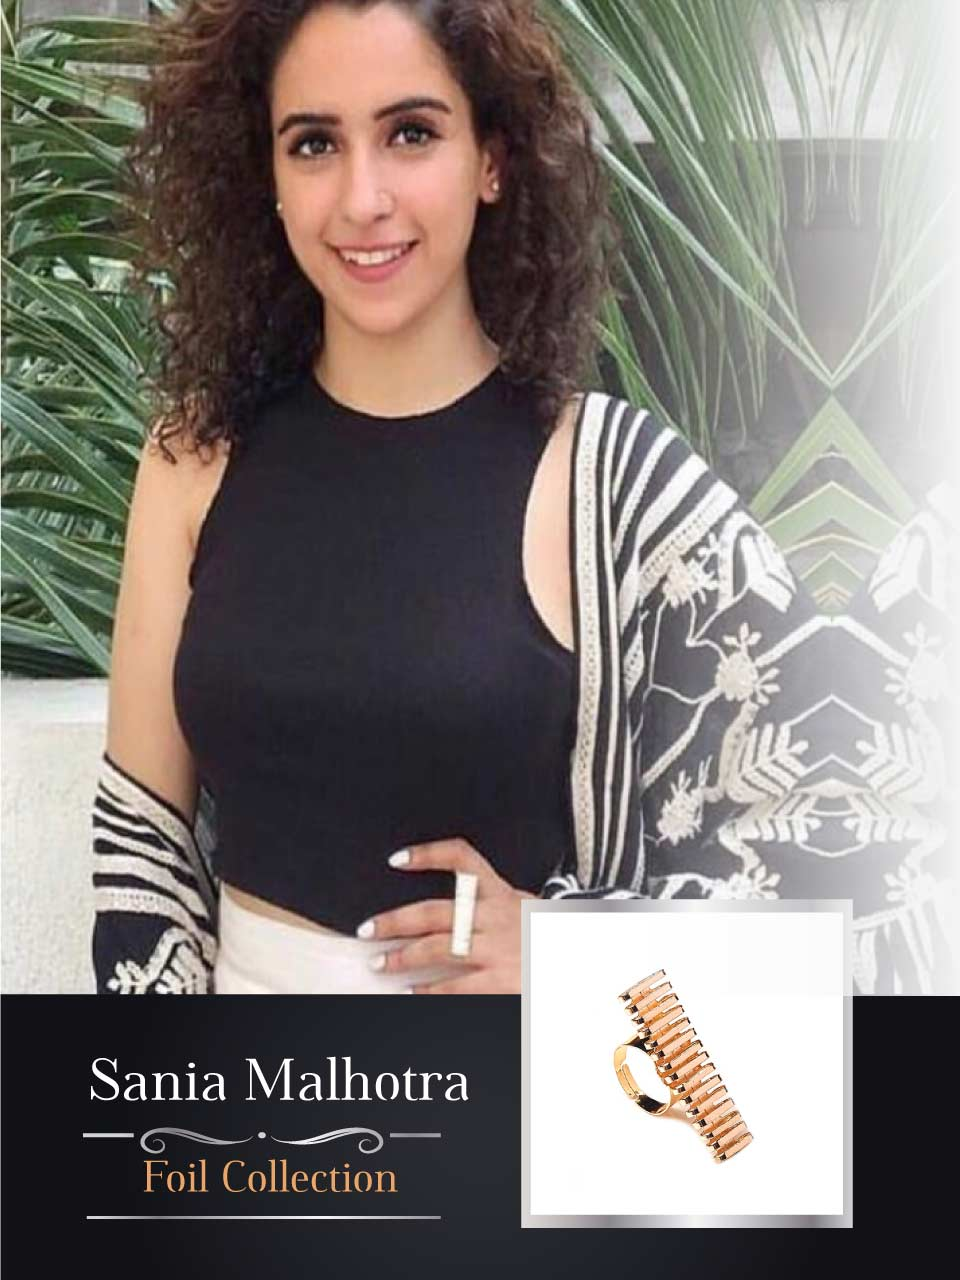 sania-malhotra-01